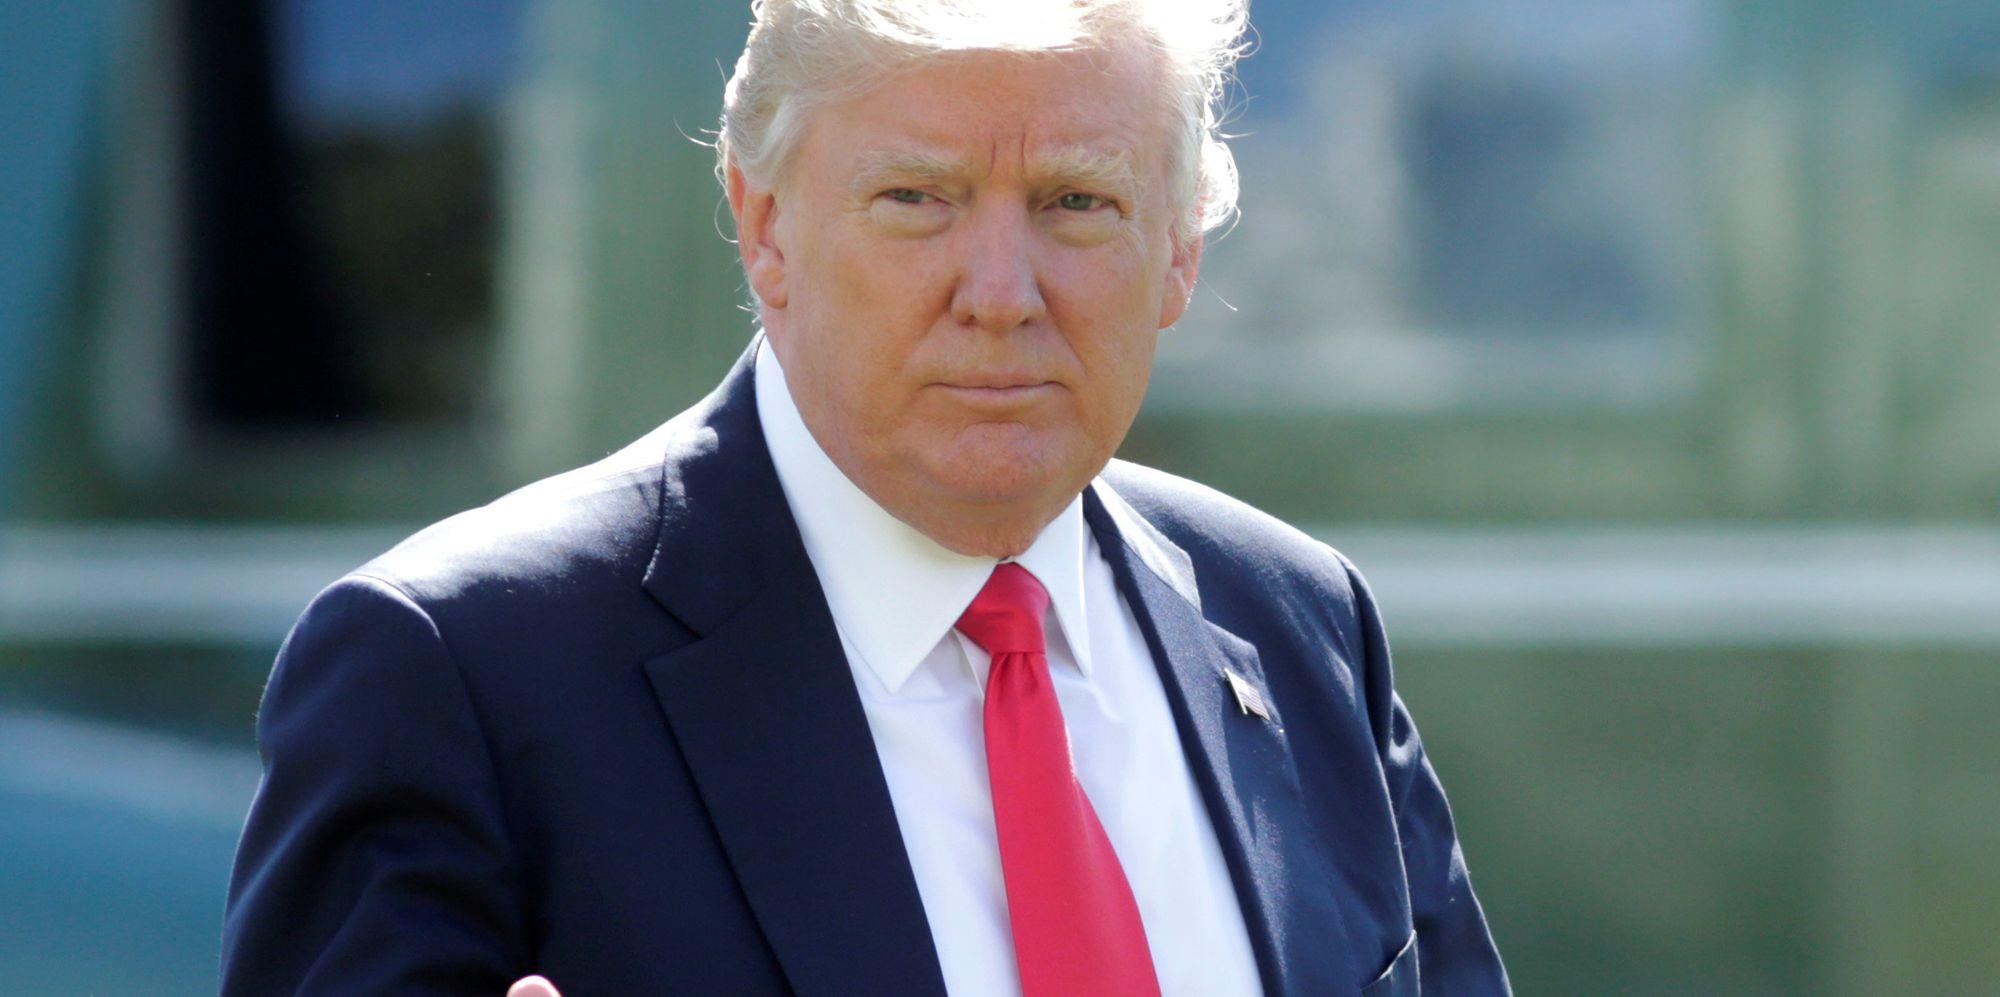 Read Live Updates On Donald Trump